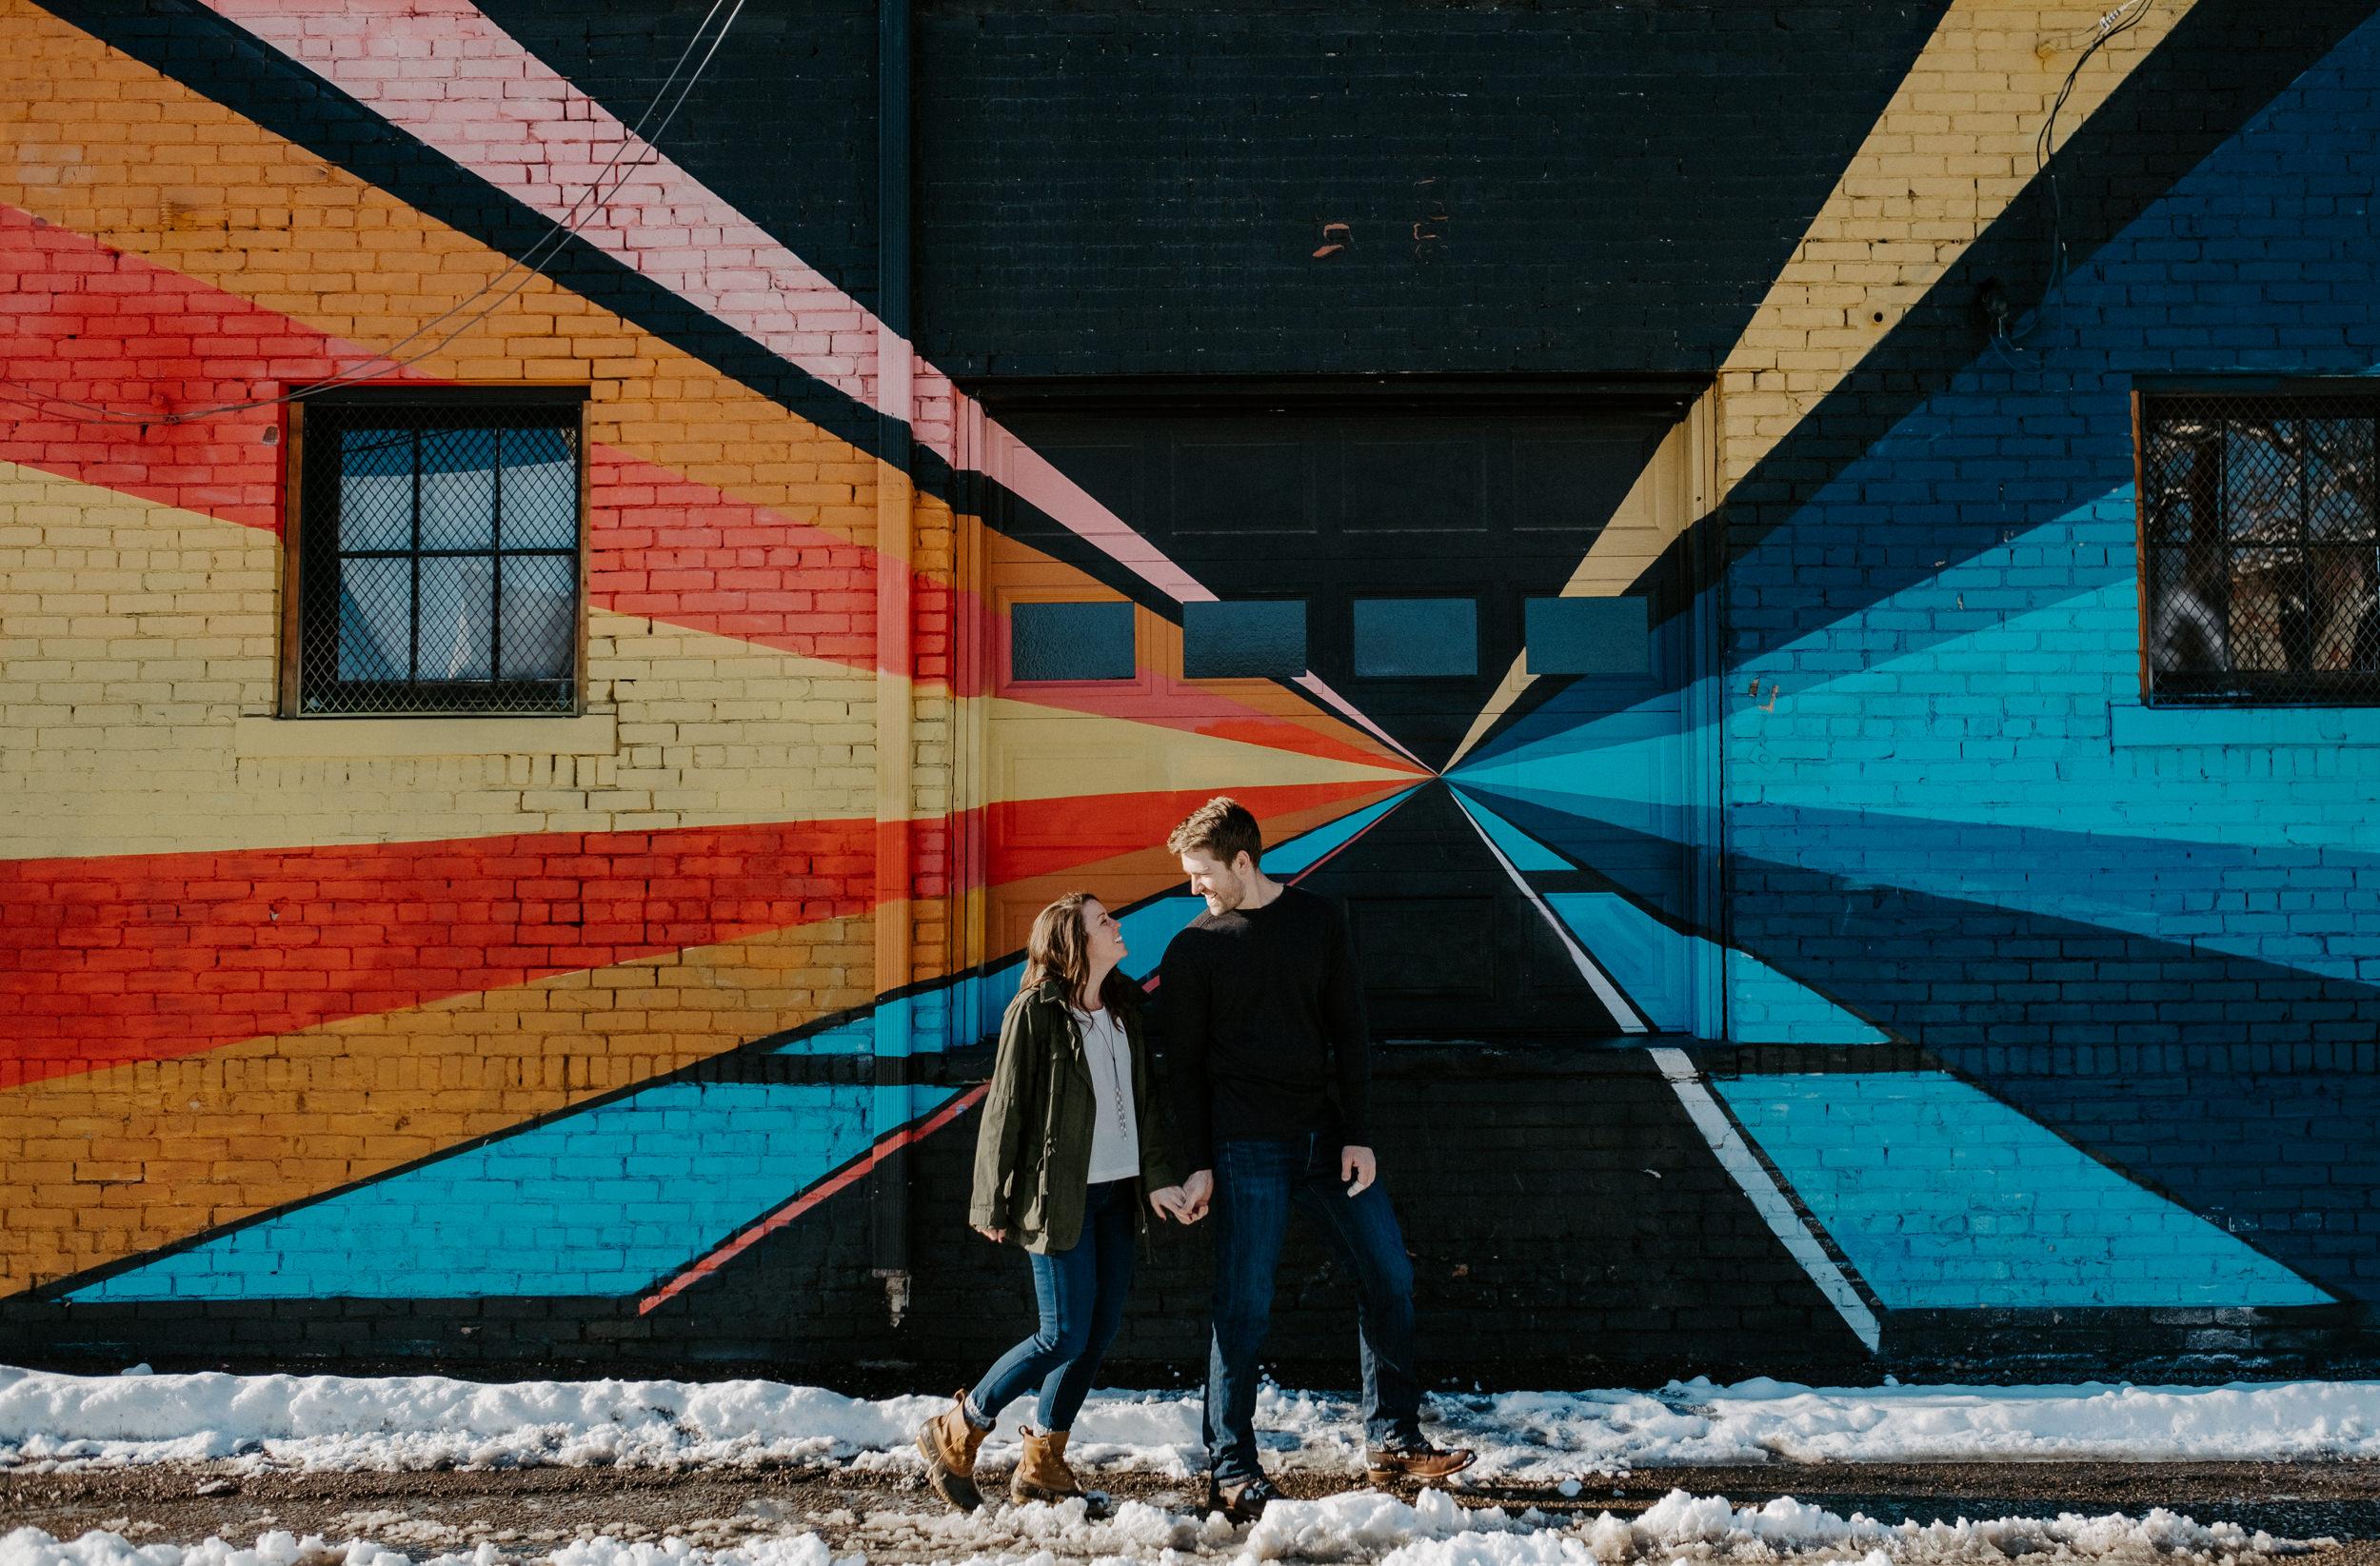 Colorado engagement session photographer. Downtown Denver engagement photos. Urban city engagement shoot inspiration.